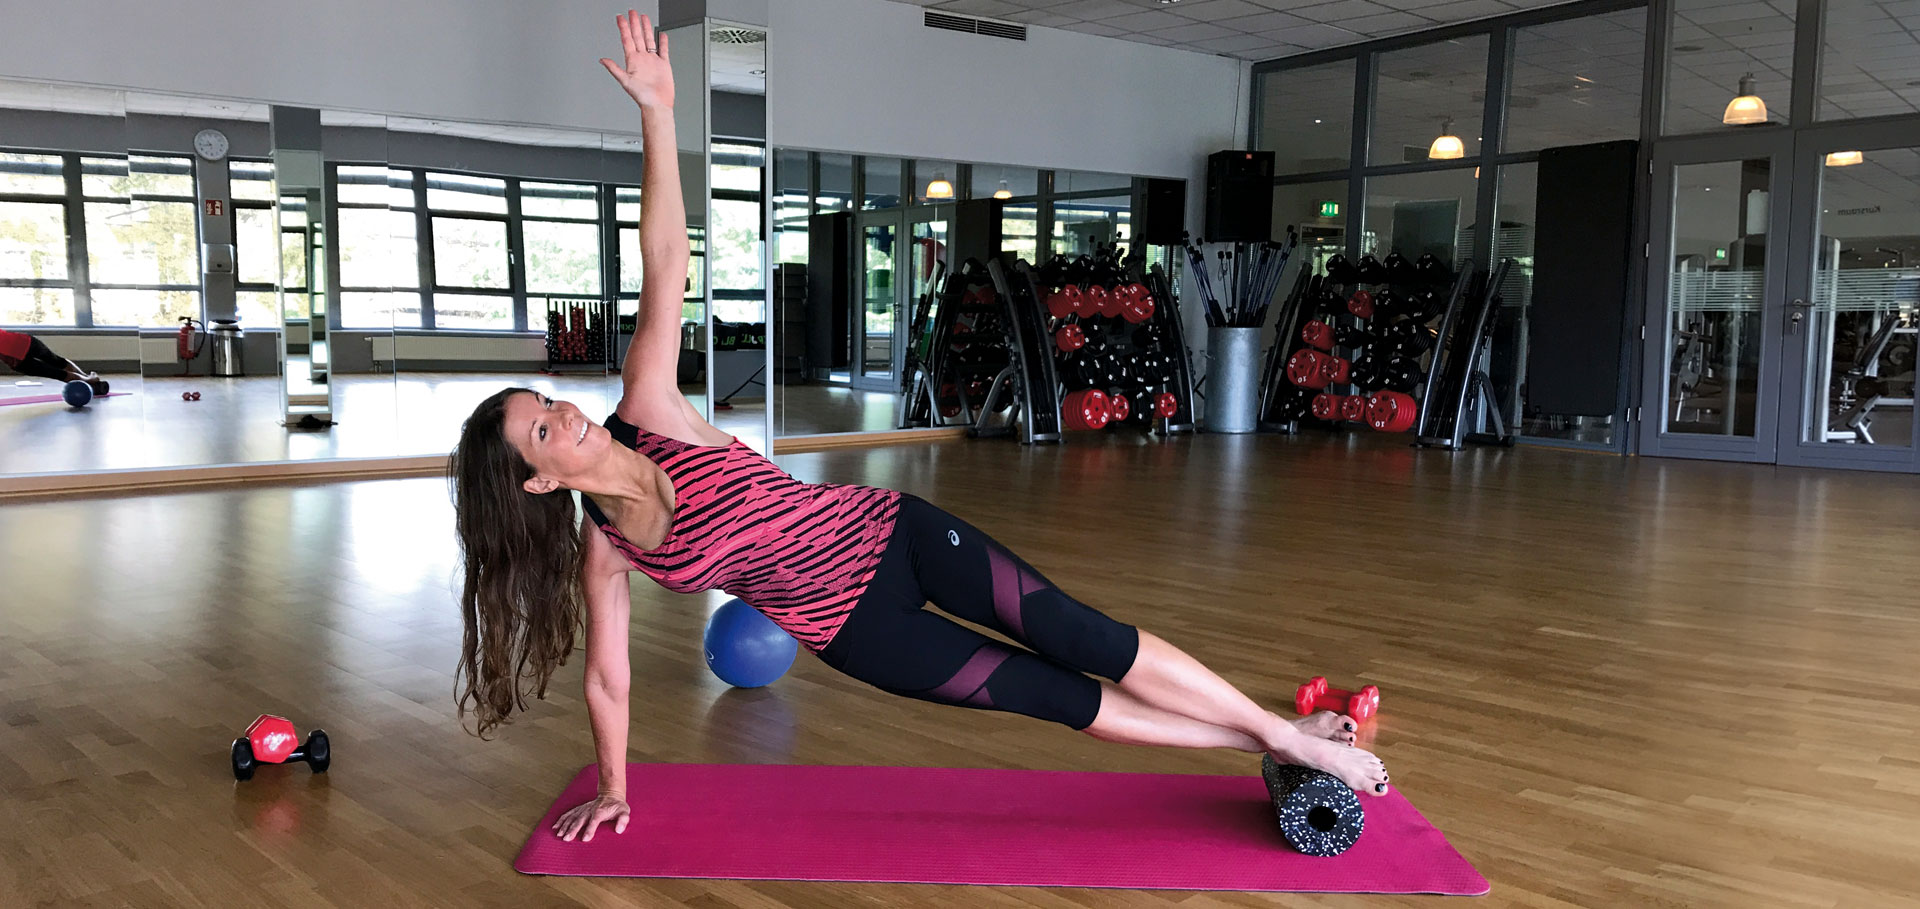 Hauptbild Thun   Petra Reiter Coaching & Pilates mitten in Thun